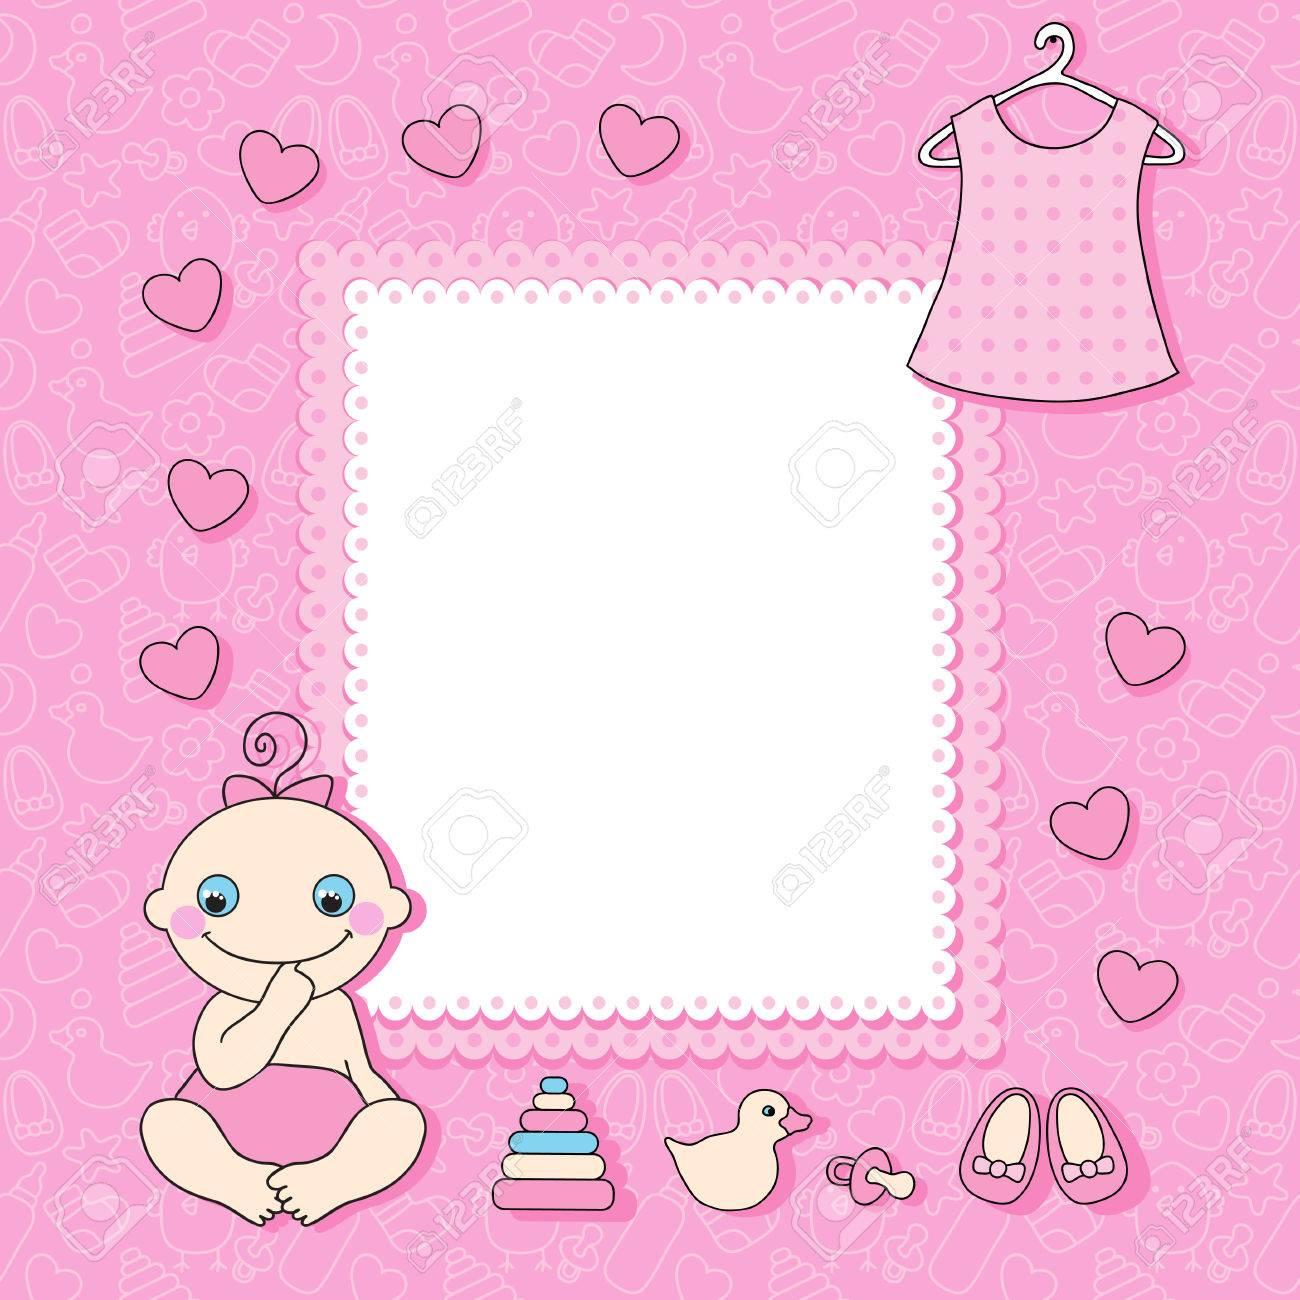 Sweet Baby Girl Announcement Card Style Cartoon Illustration Royalty ...